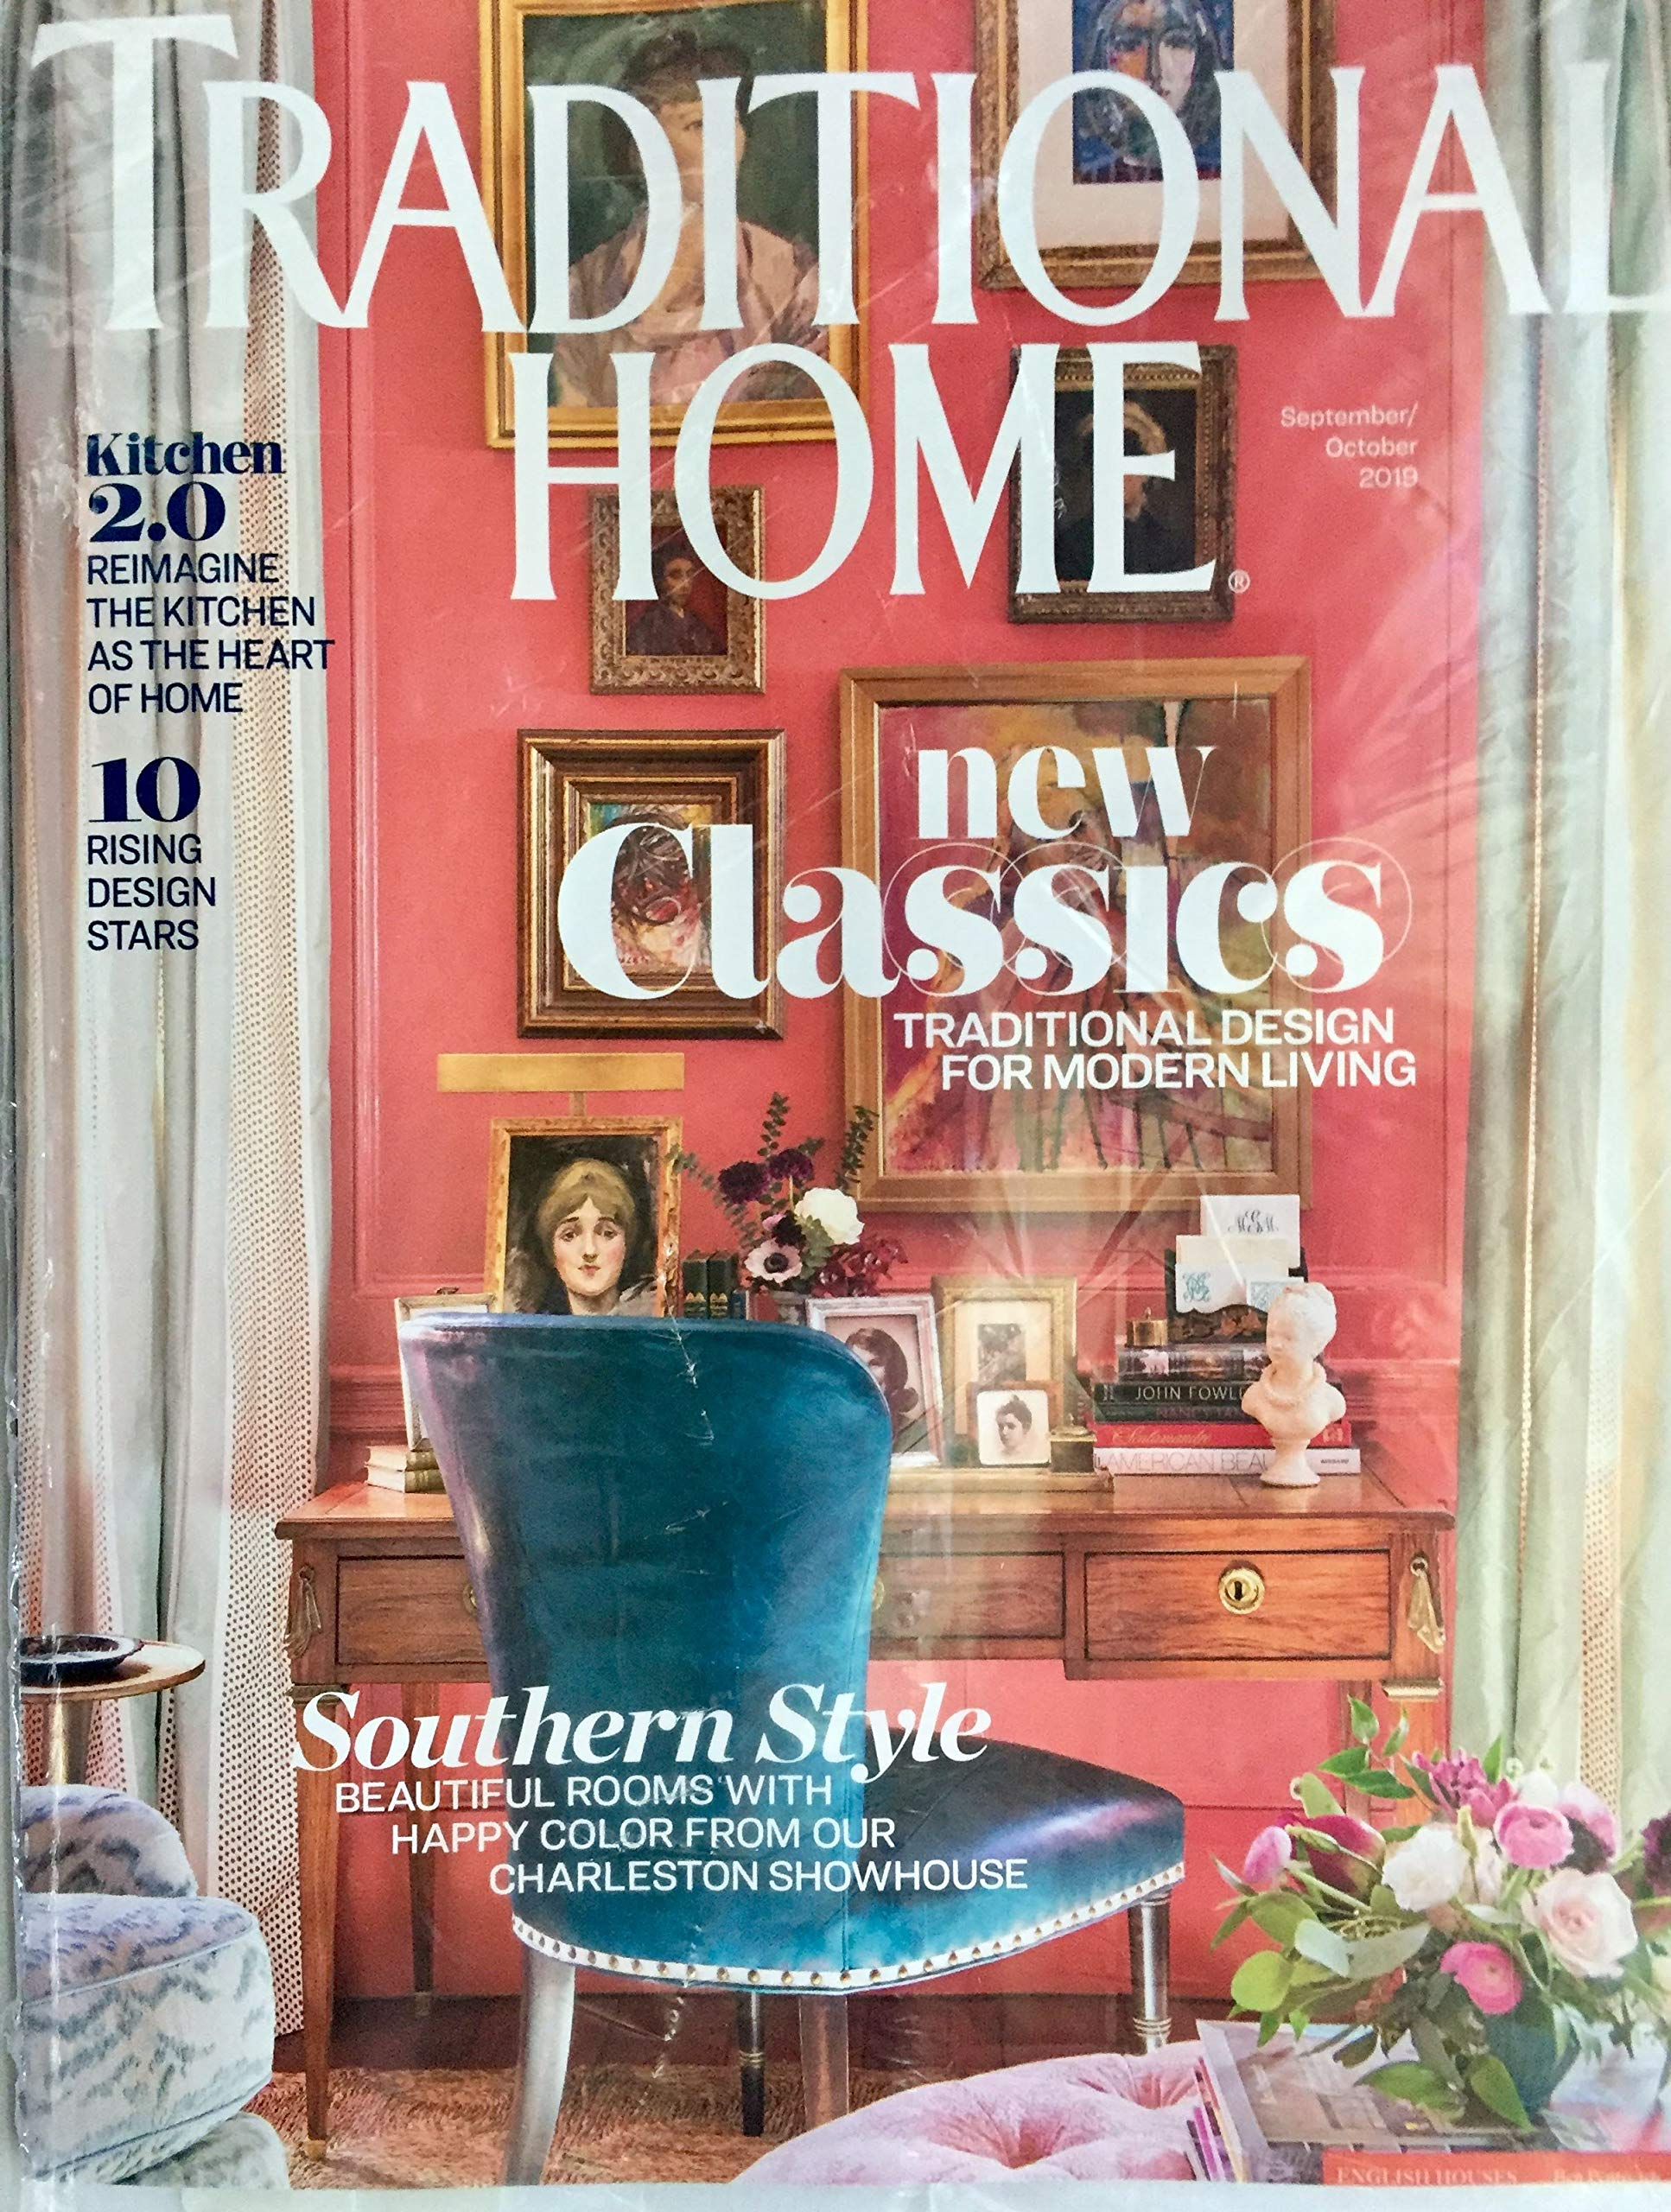 Traditional Home Magazine September October 2019 New Classics Traditional Design For Modern Living Amazon Com Books